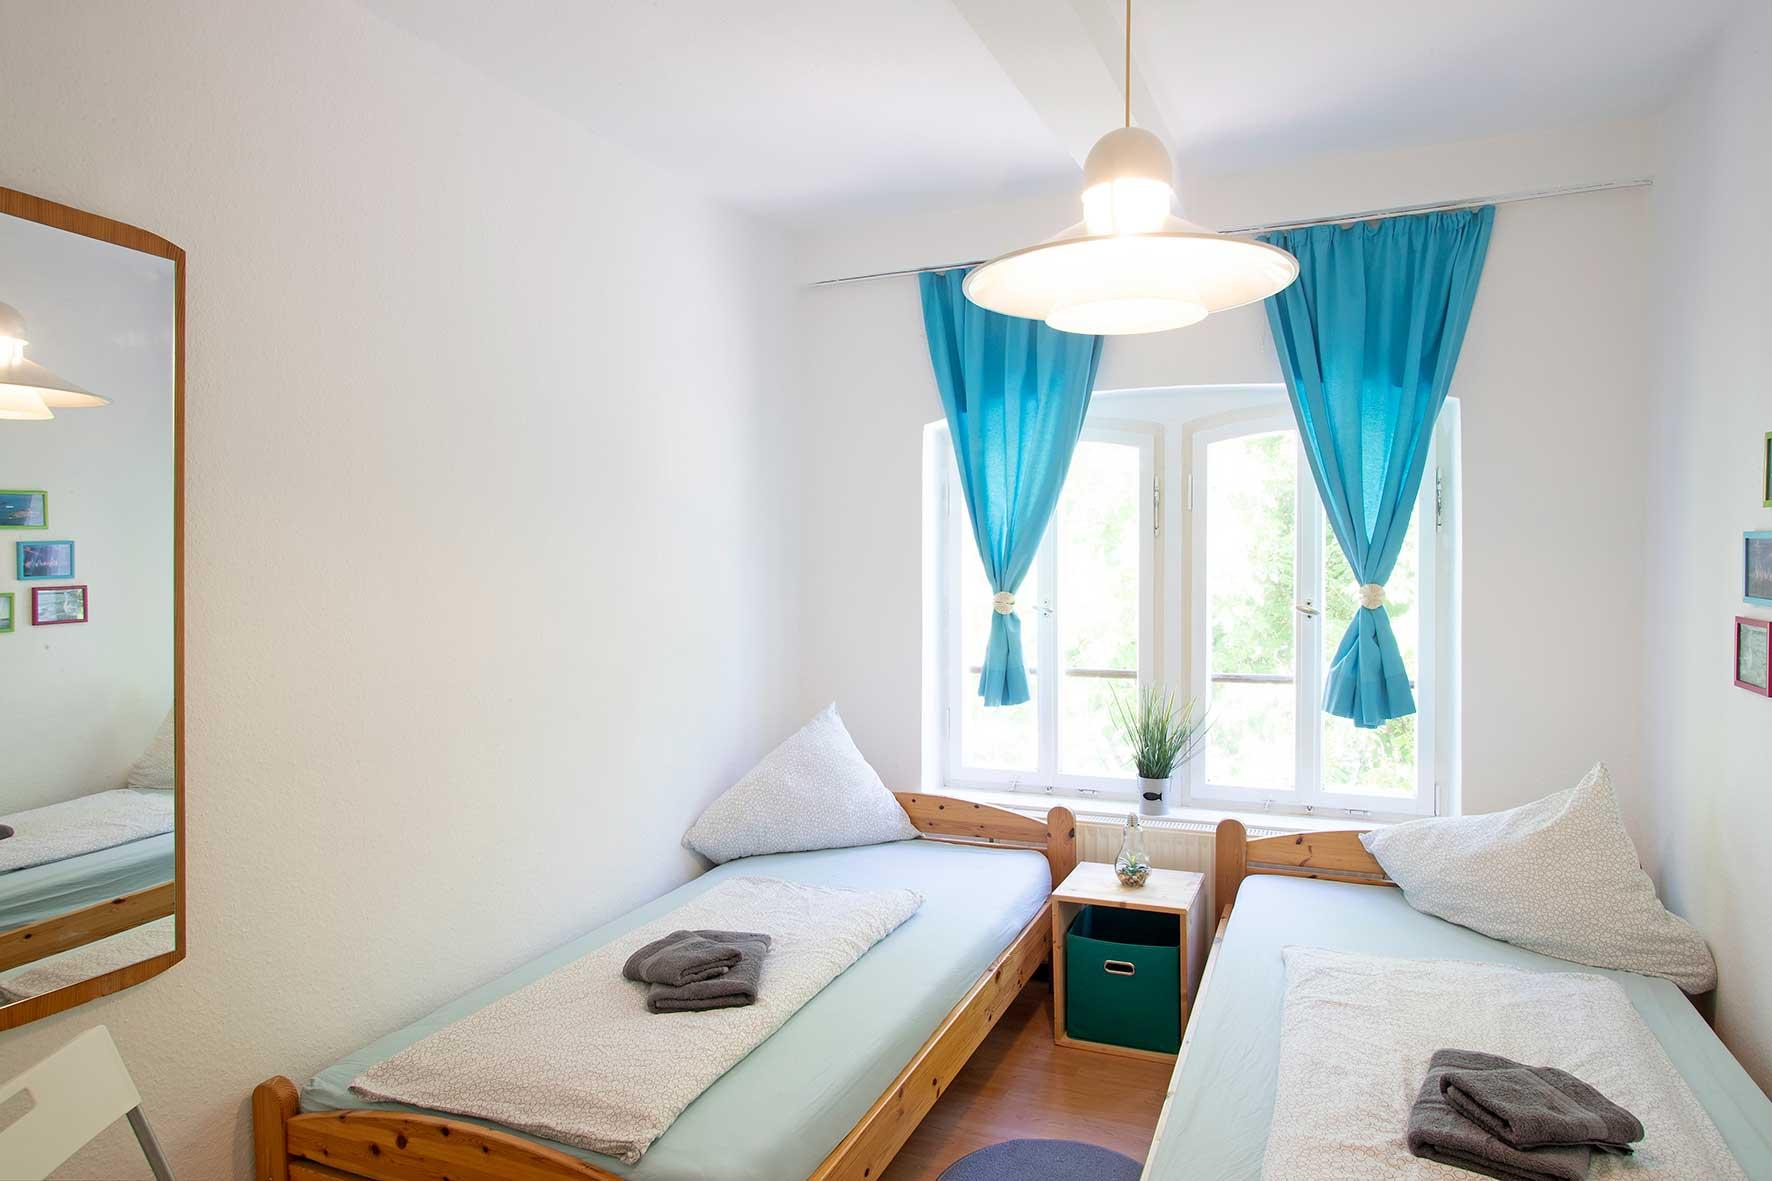 Zimmer 22, Doppelzimmer